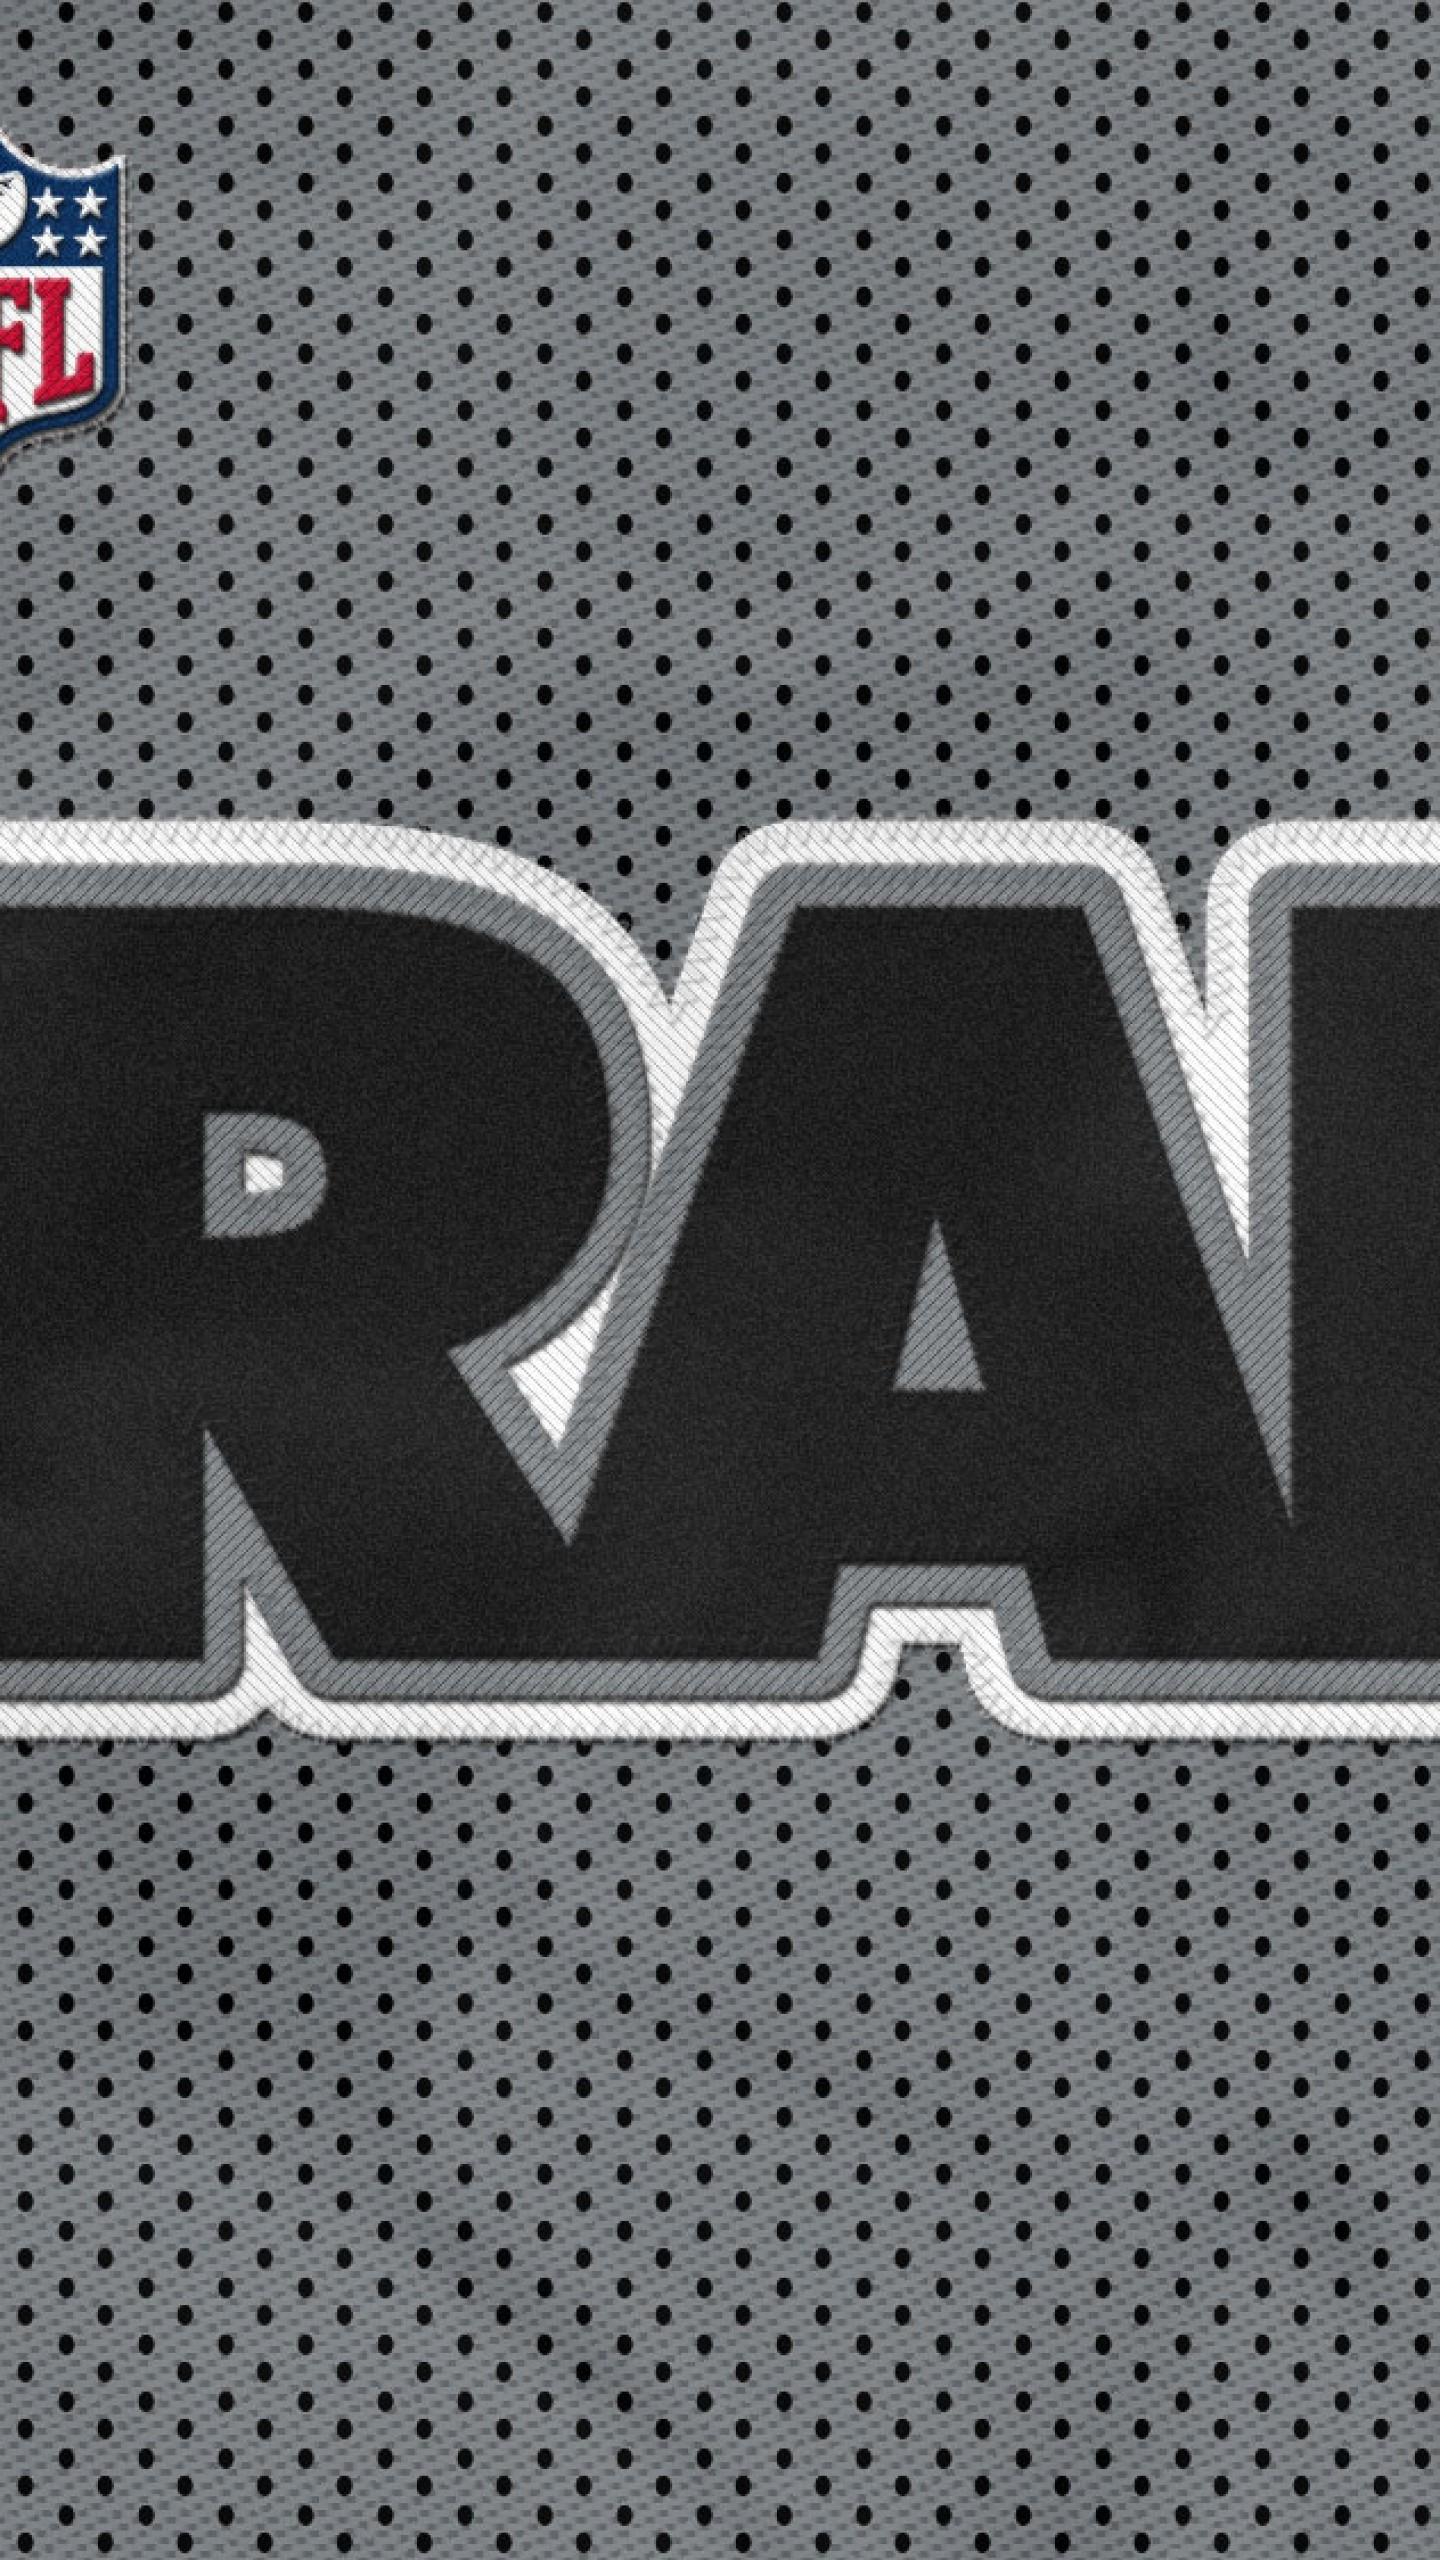 Preview wallpaper oakland raiders, football club, nfl, los angeles raiders  1440×2560